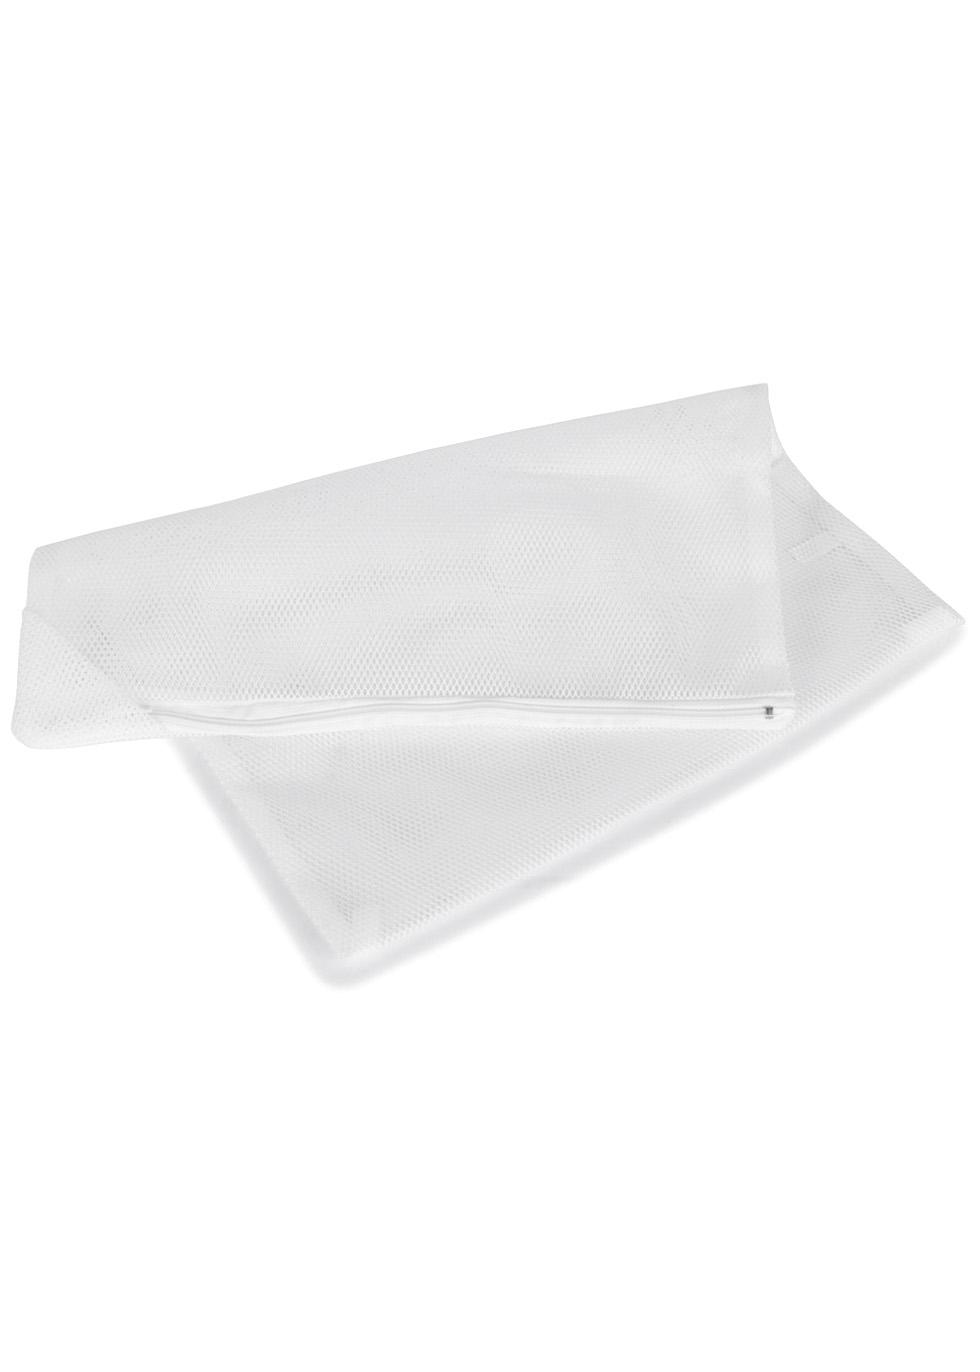 White medium mesh lingerie laundry pouch - FASHION FORMS